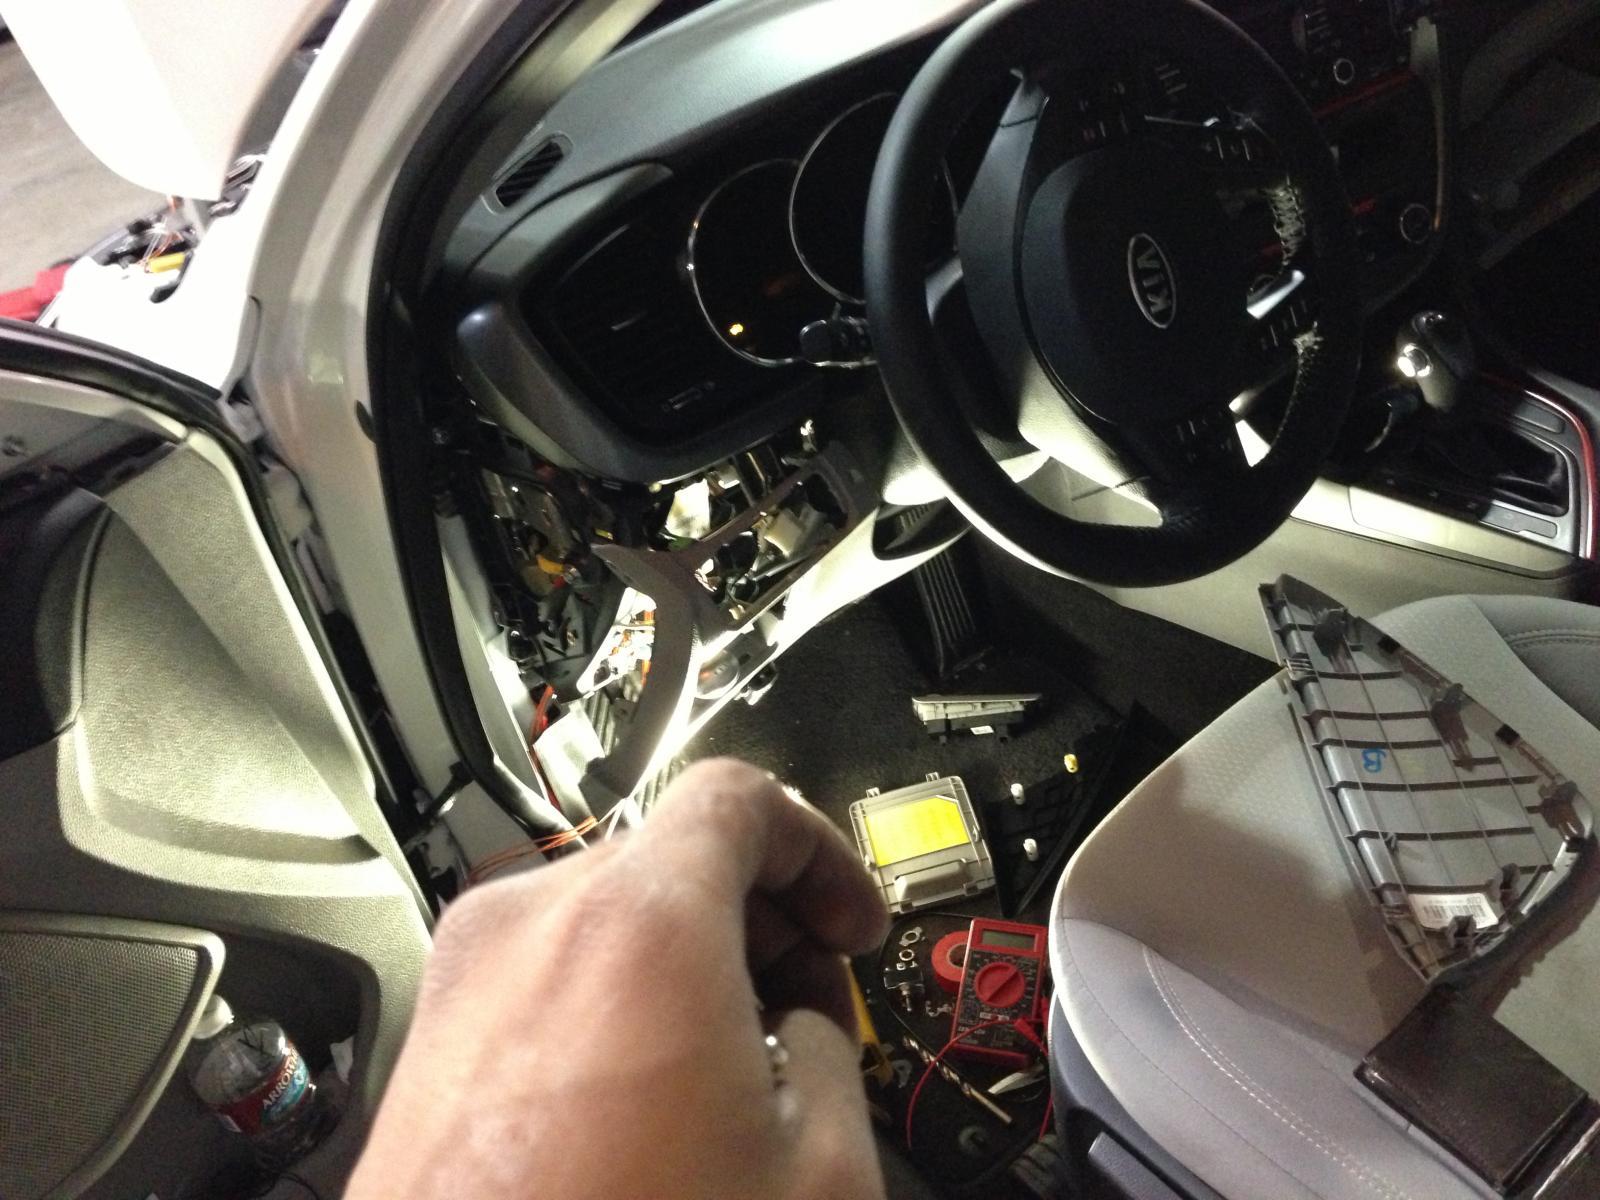 Kia Alarm Wiring Diagram Improve 2012 Led Drl 3 Wire Flashes W Hi Low Rh Optimaforums Com